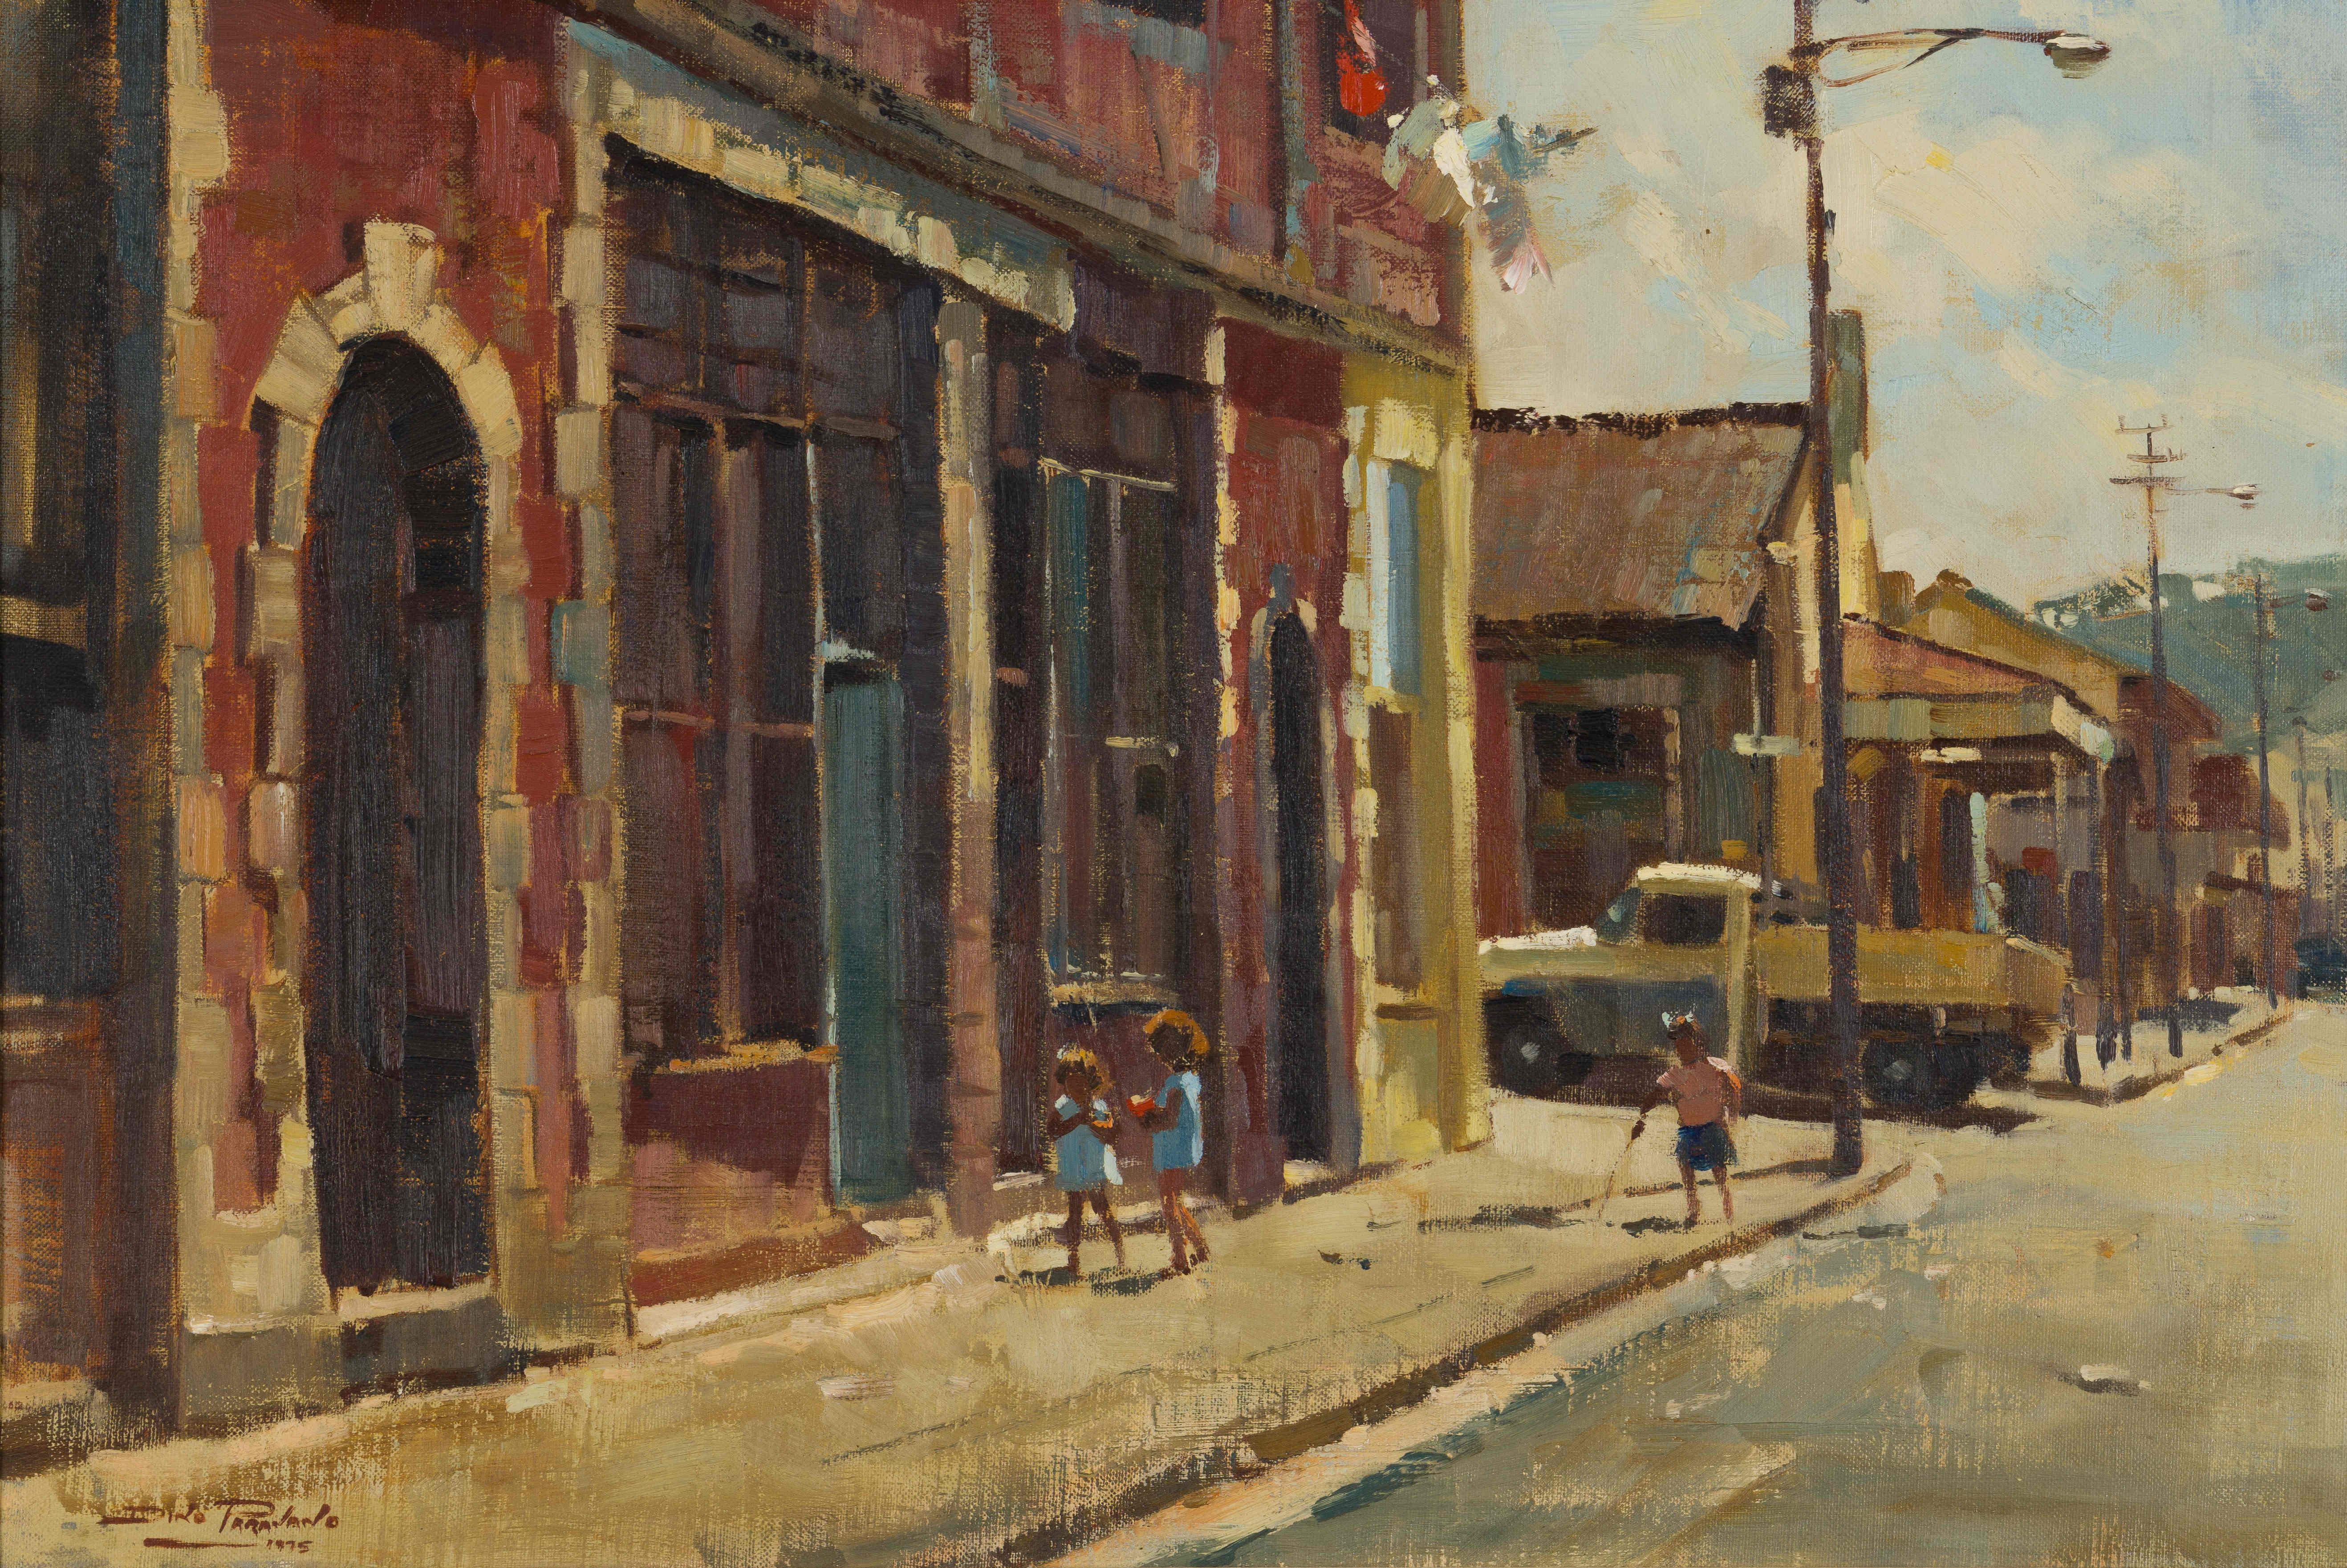 Lot 137 | 15 July 2019 | Strauss & Co - Fine Art Auctioneers